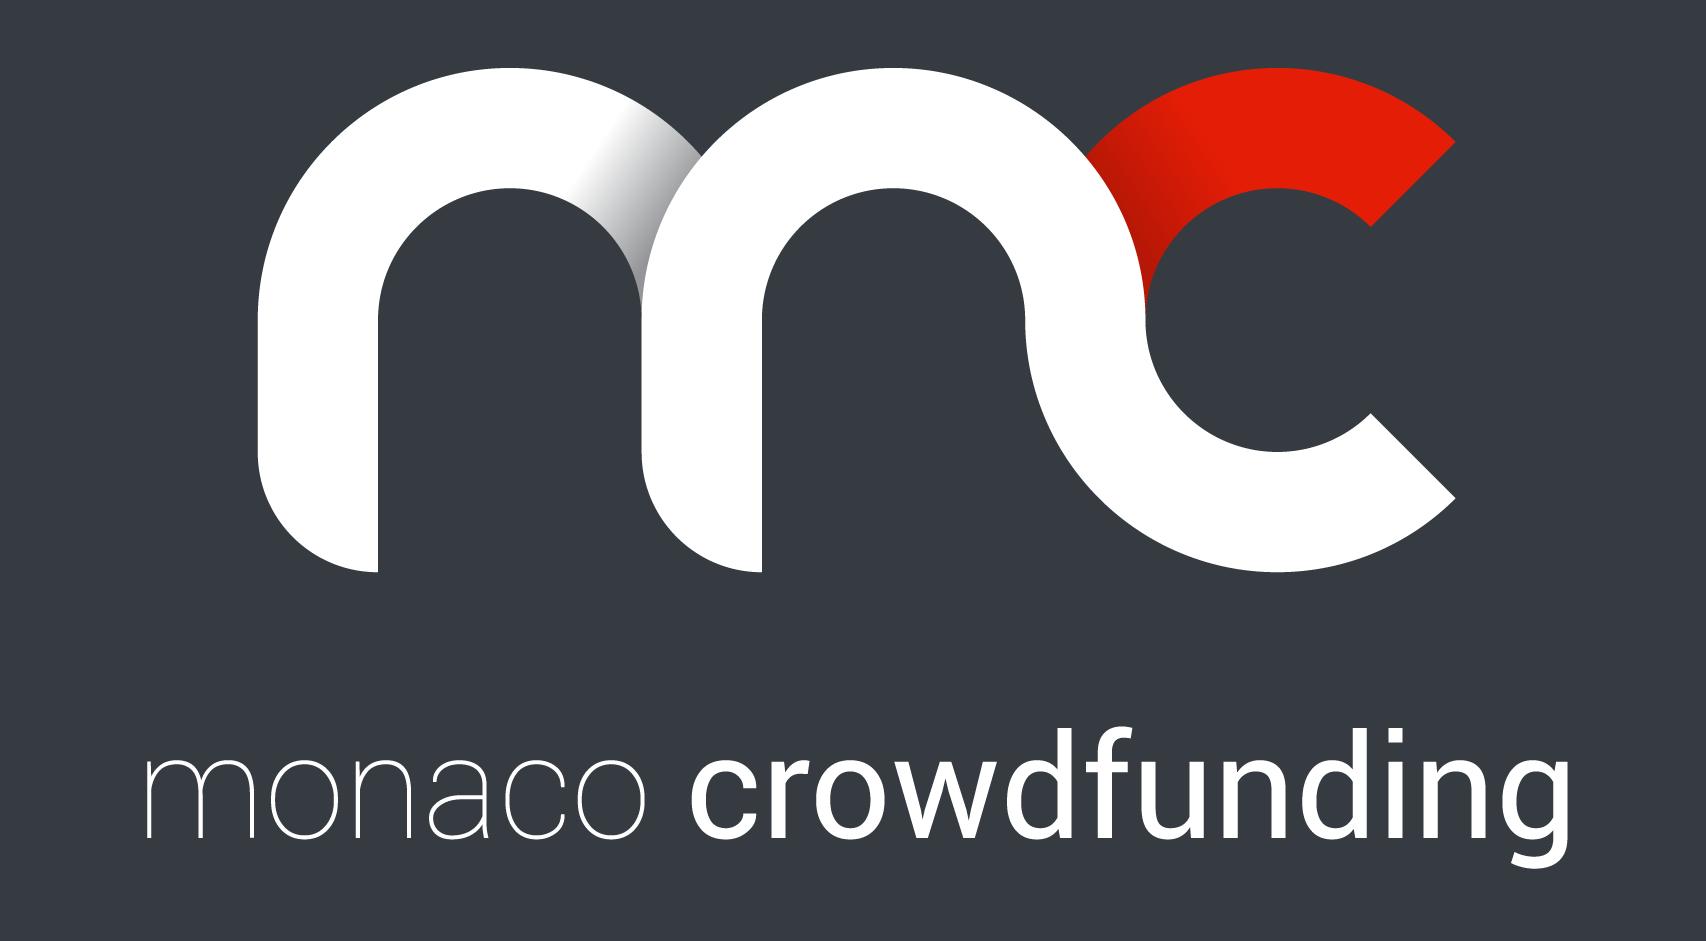 MONACO CROWDFUNDING